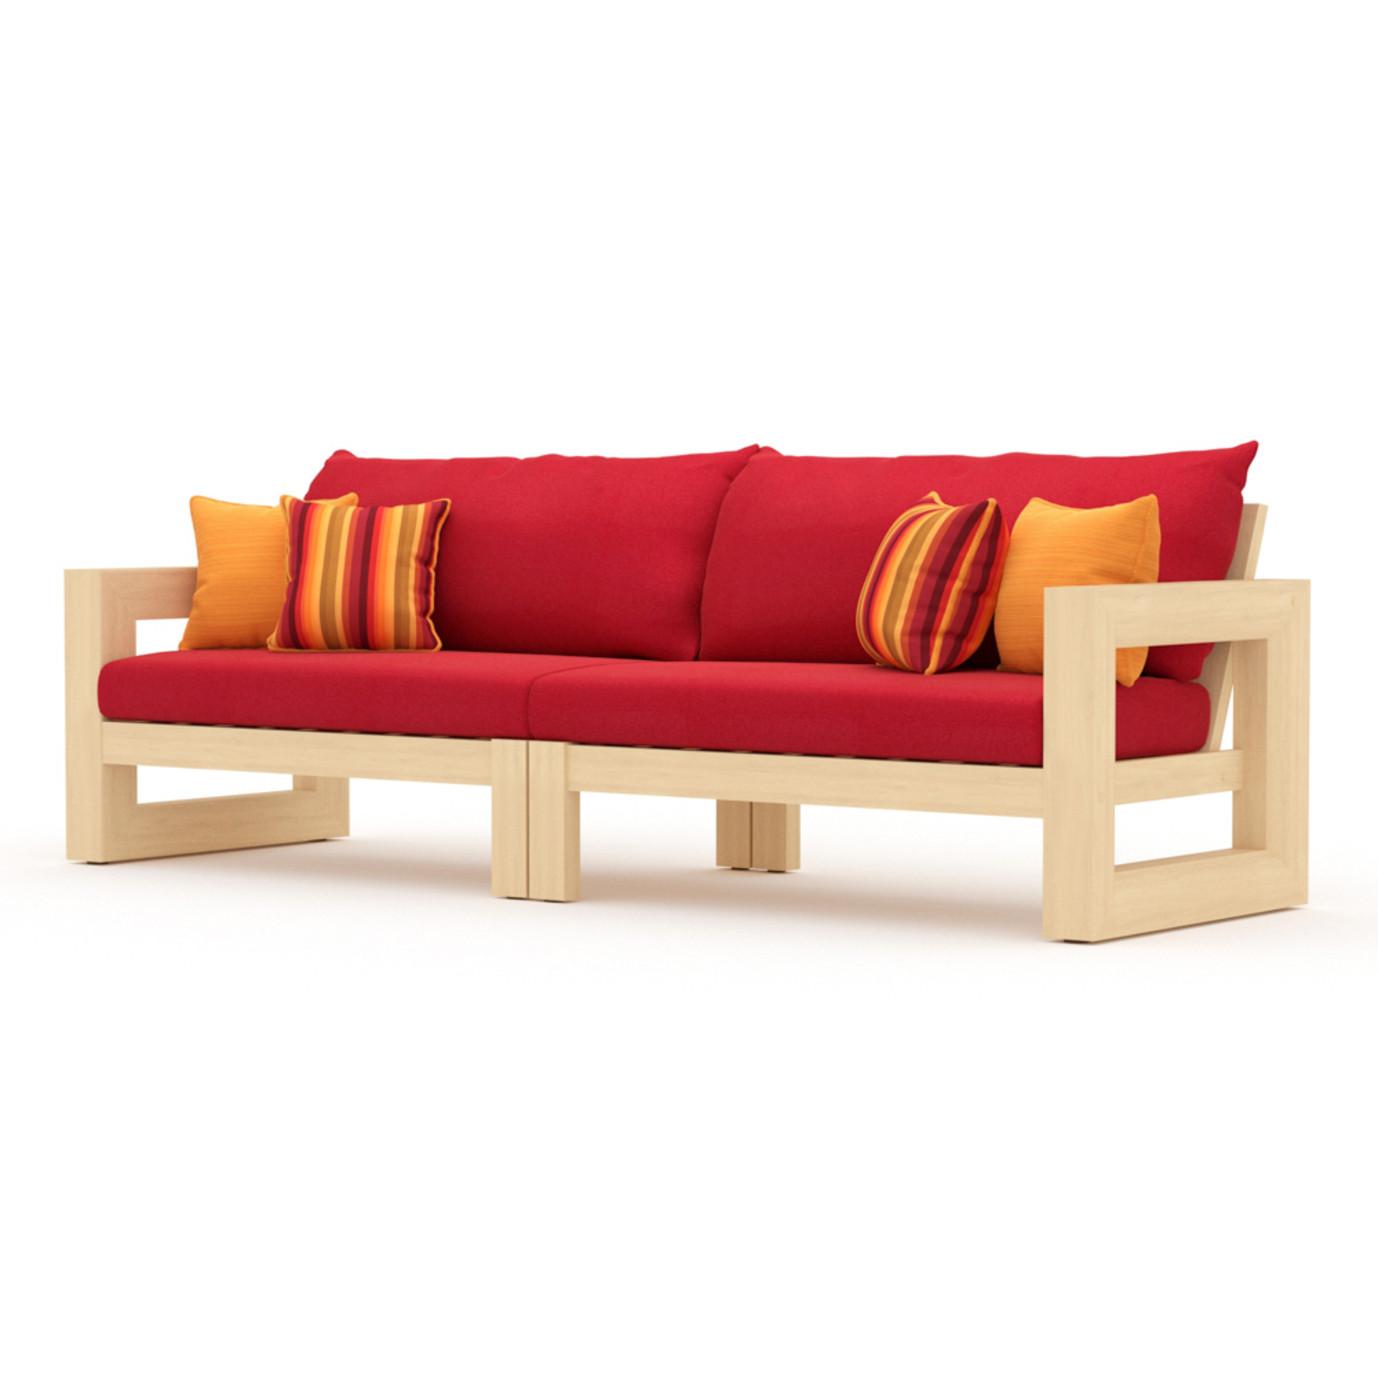 Benson 96in Sofa - Sunset Red